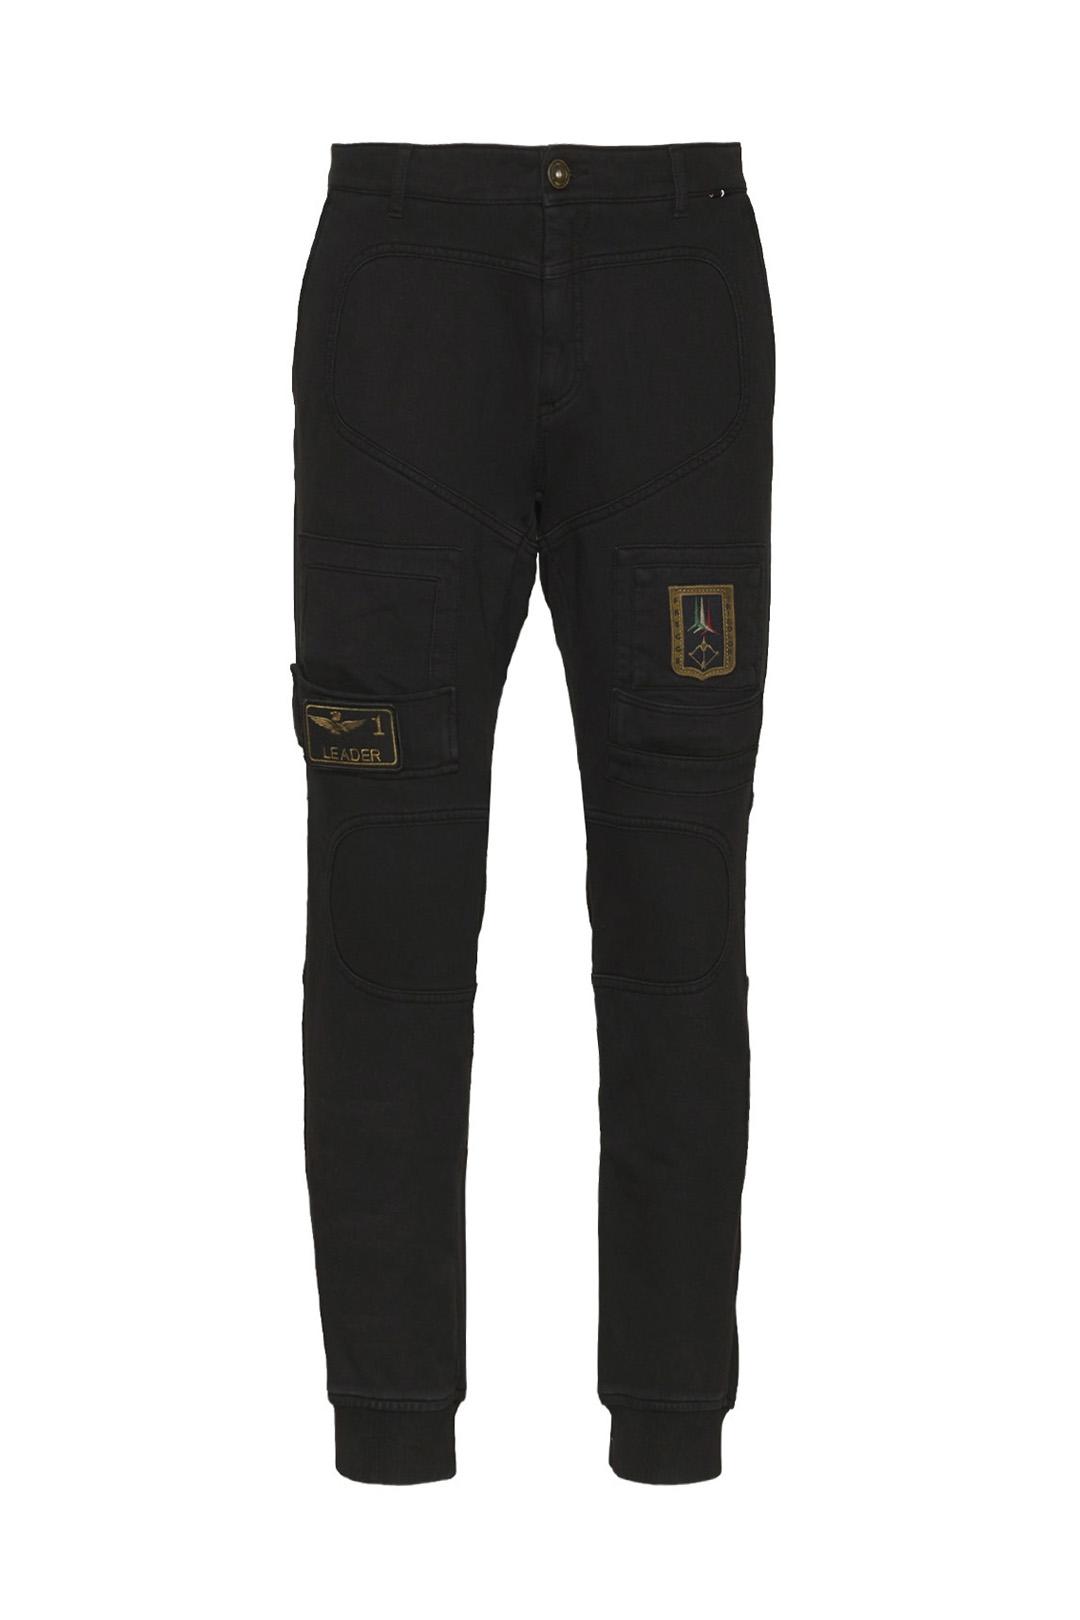 Cotton jersey Anti-G trousers            1